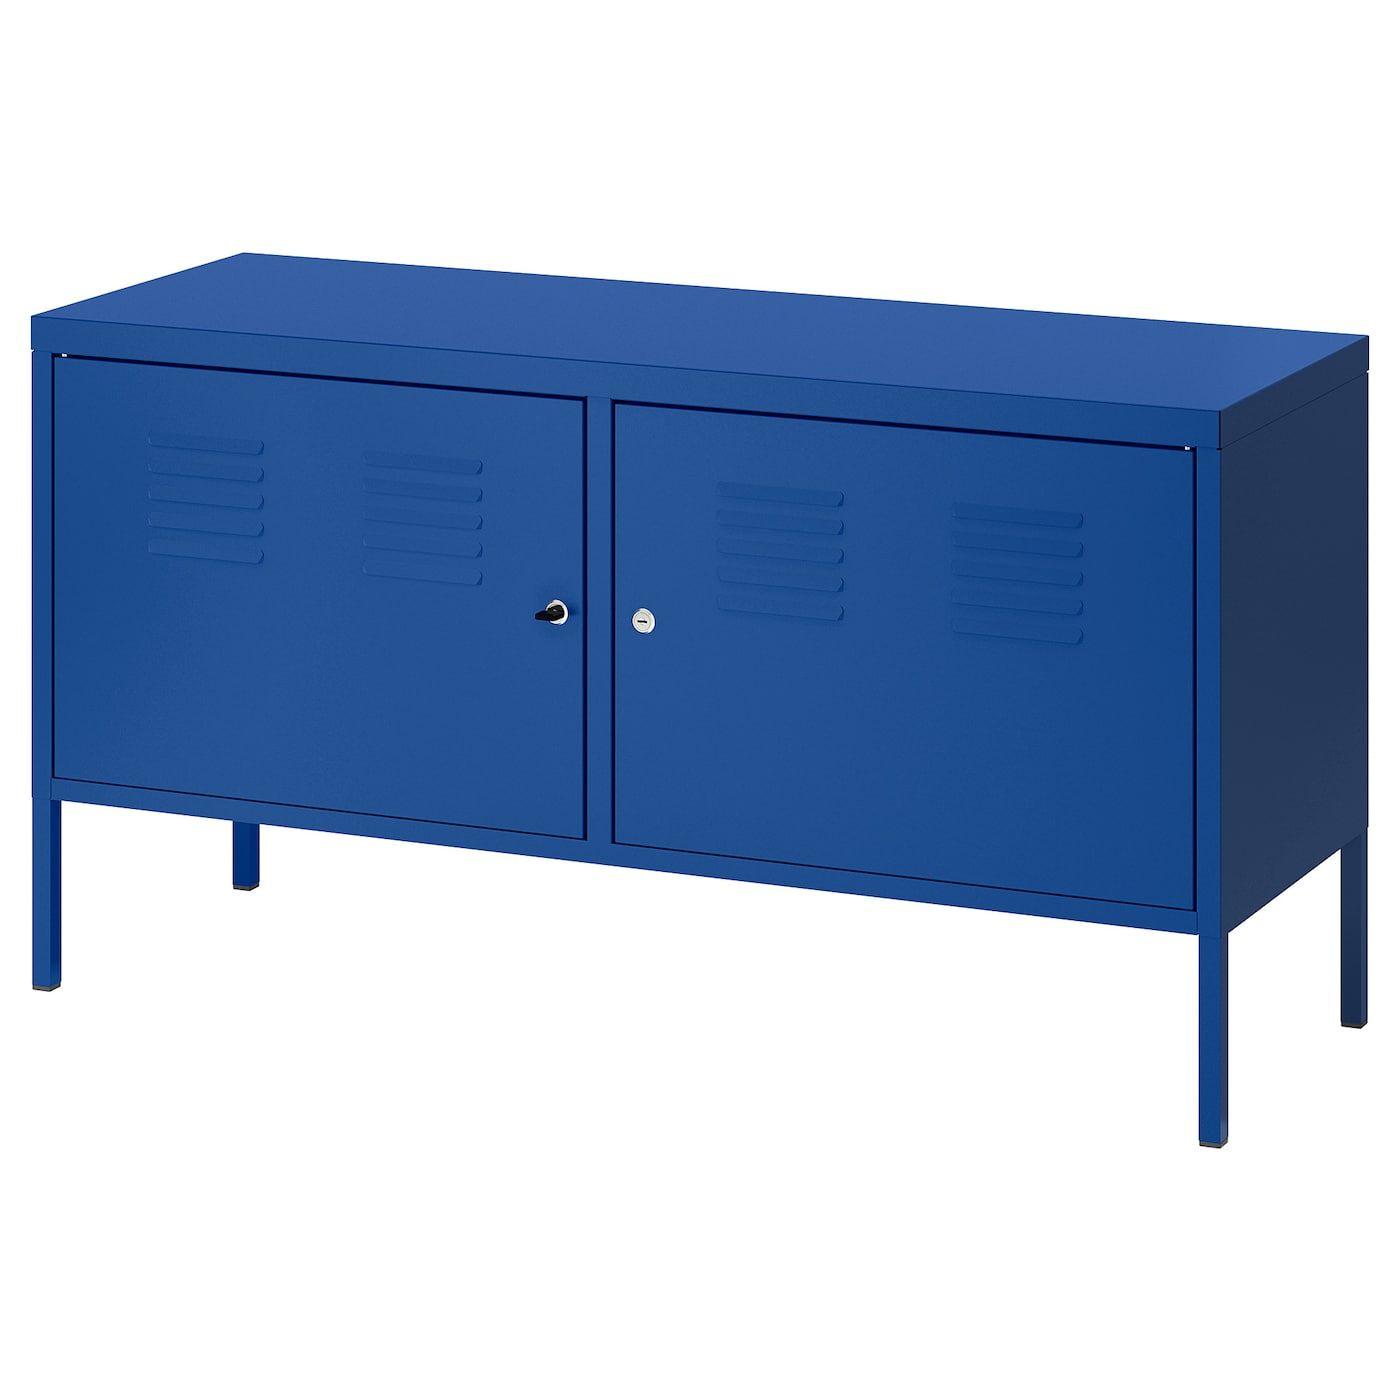 Ps Armoire Metallique Bleu 119x63 Cm Armoire Metallique Mobilier De Salon Meuble Rangement Ikea